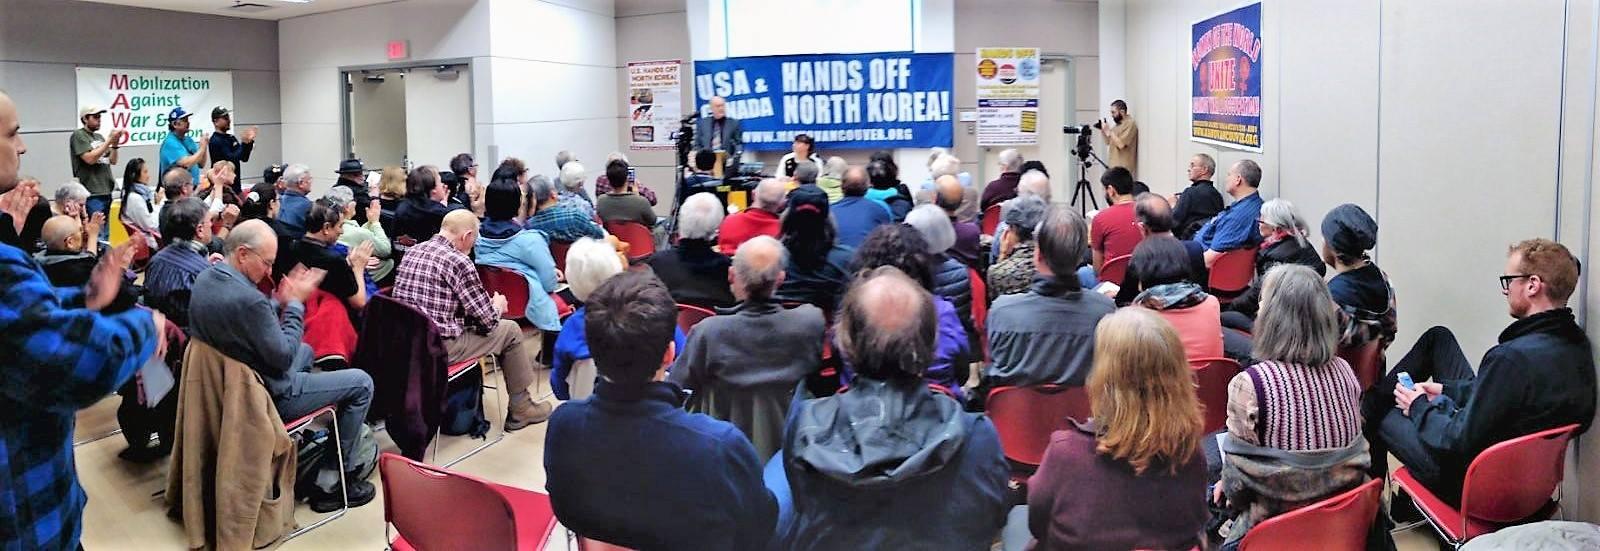 north korea forum participants